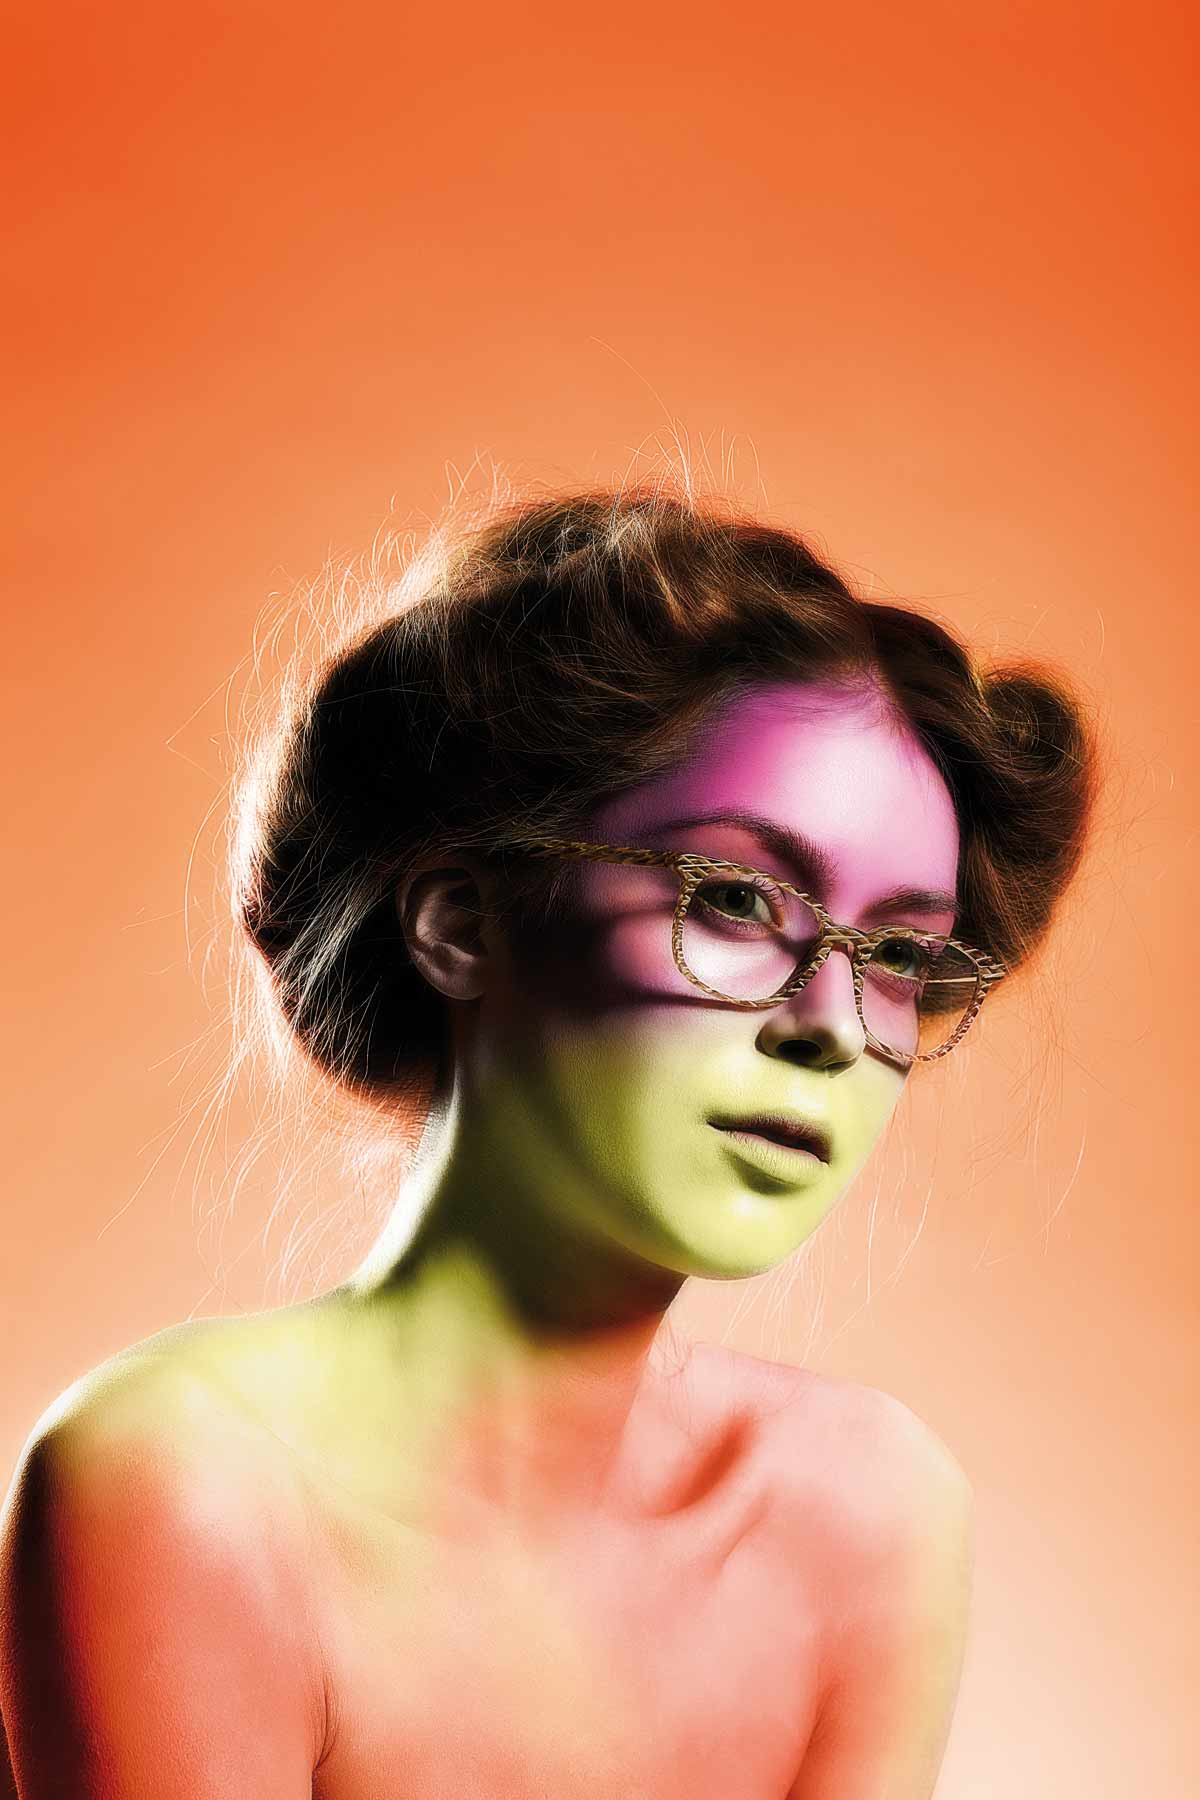 Eyewear Magazine 4_2011.03.13-people-eyewear-23926